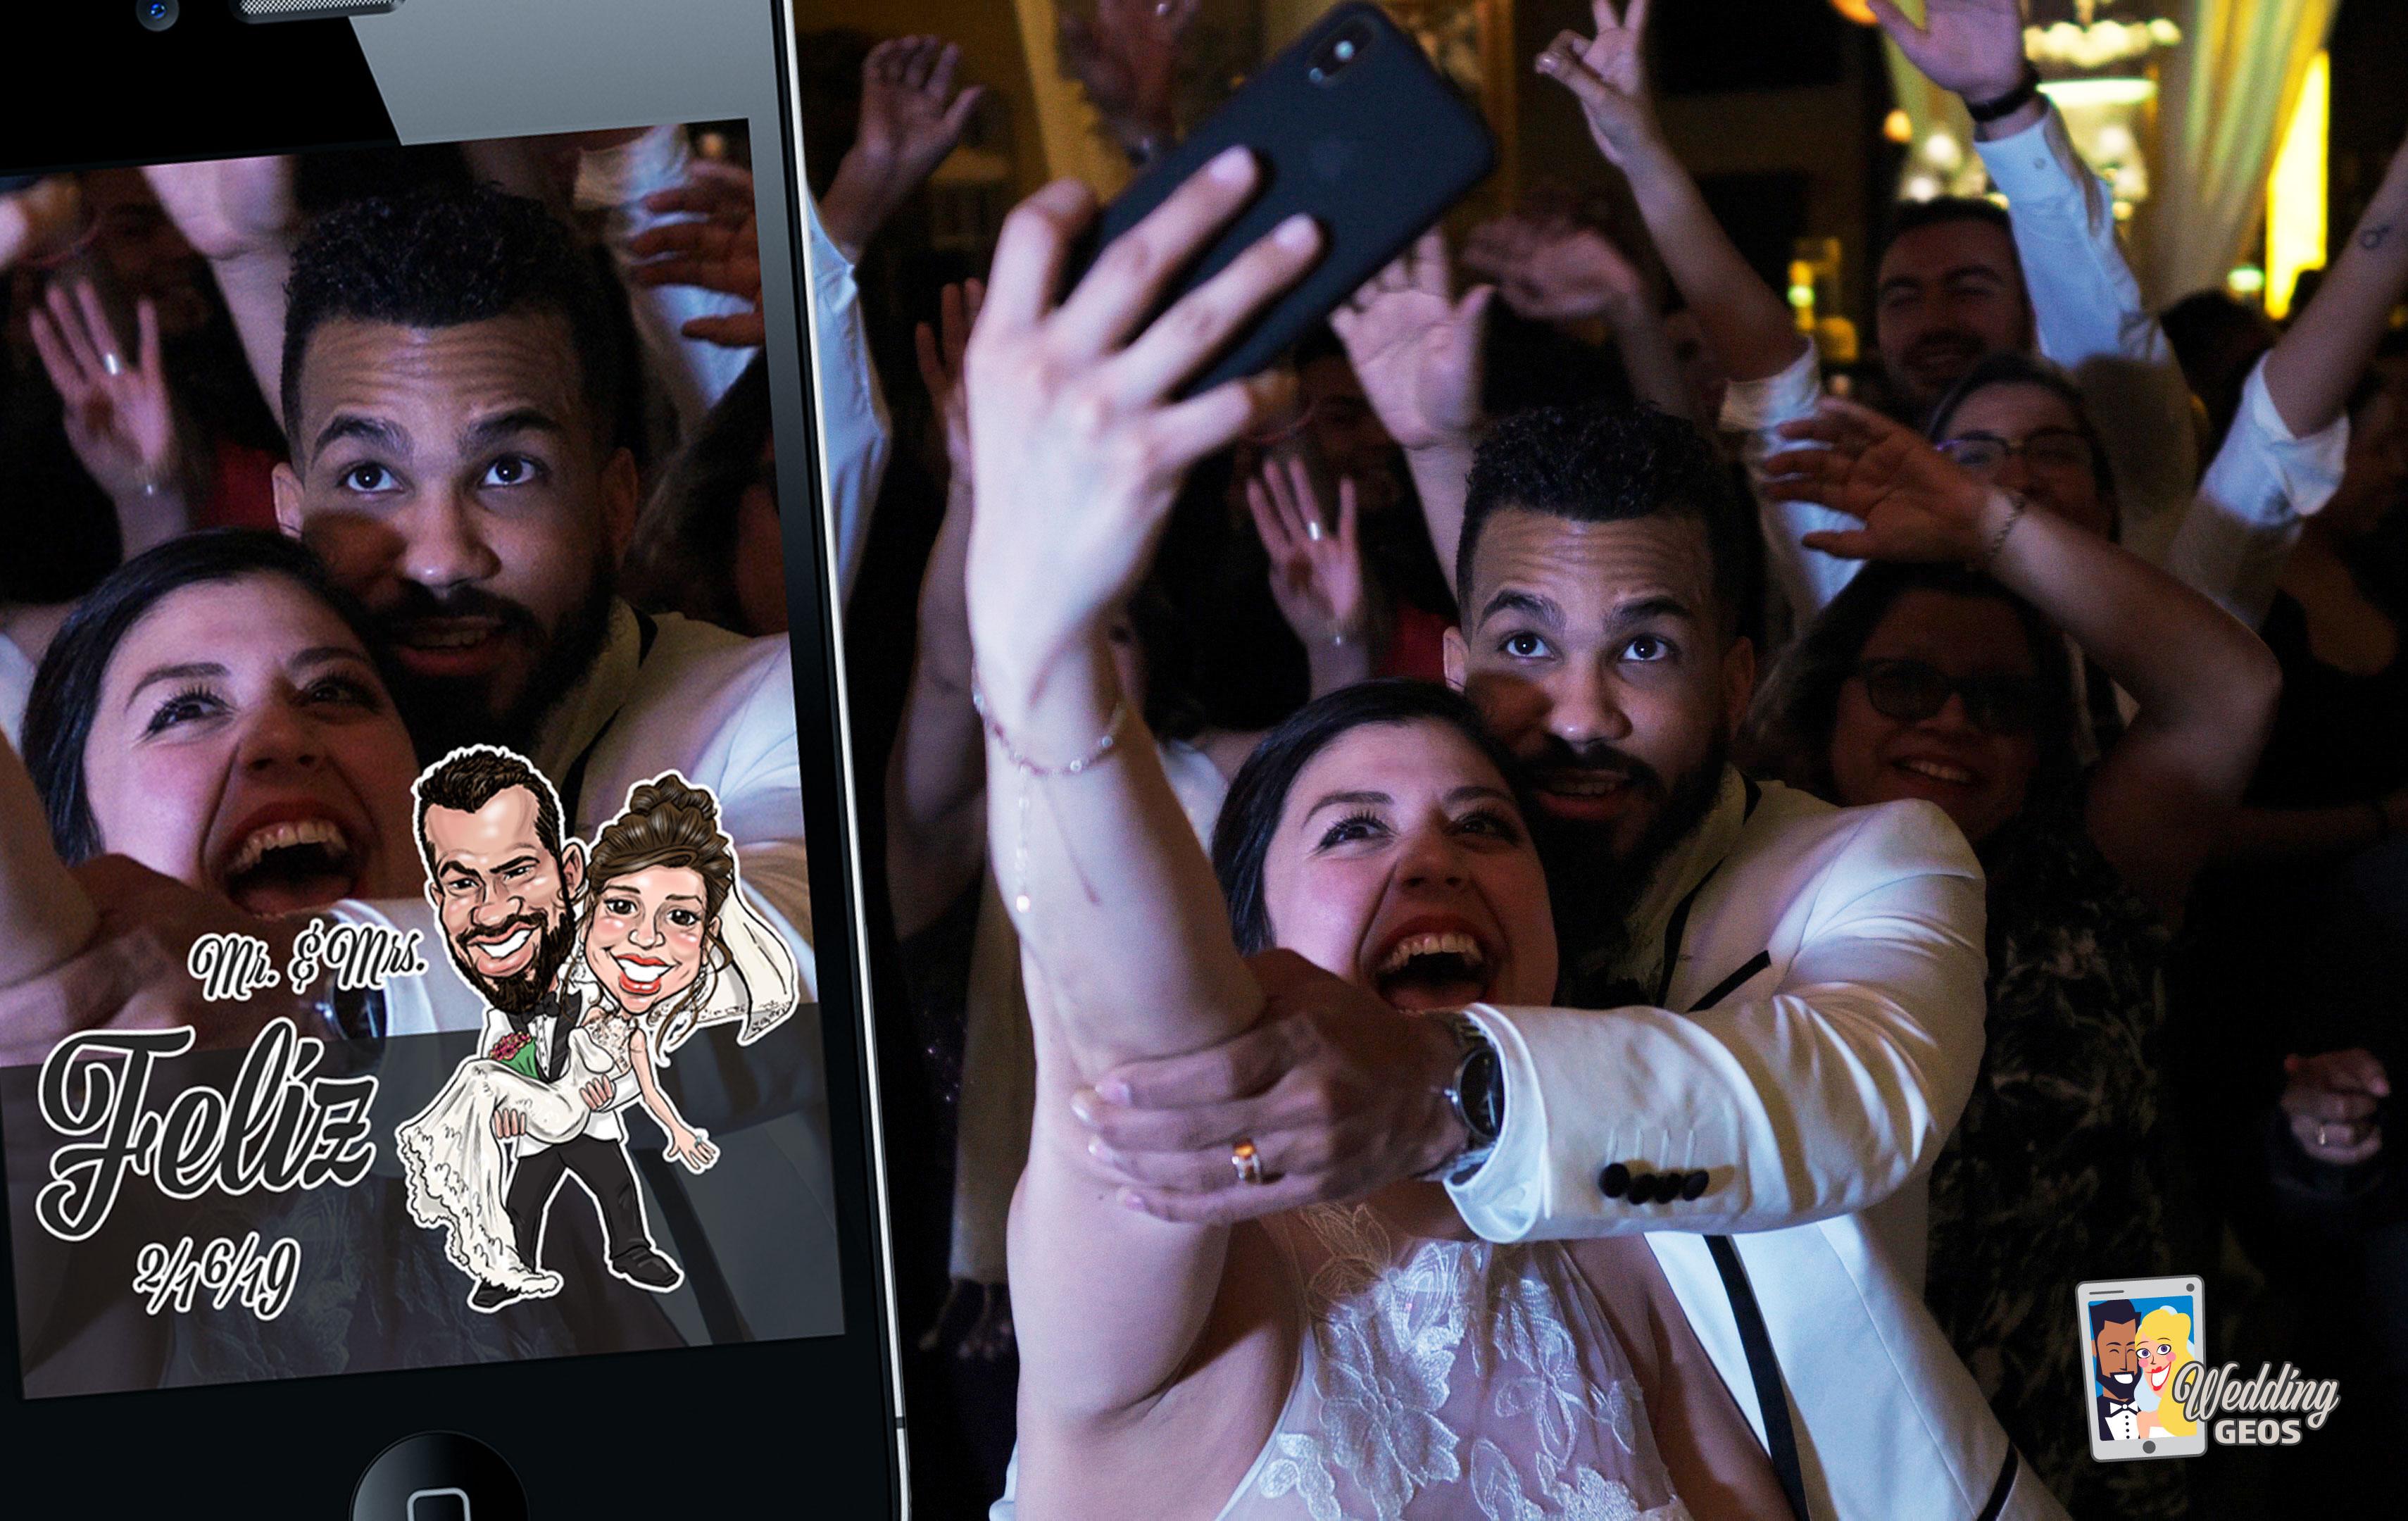 //www.baxillustration.com/wp-content/uploads/2019/02/Feliz-Wedding-1-1.jpg